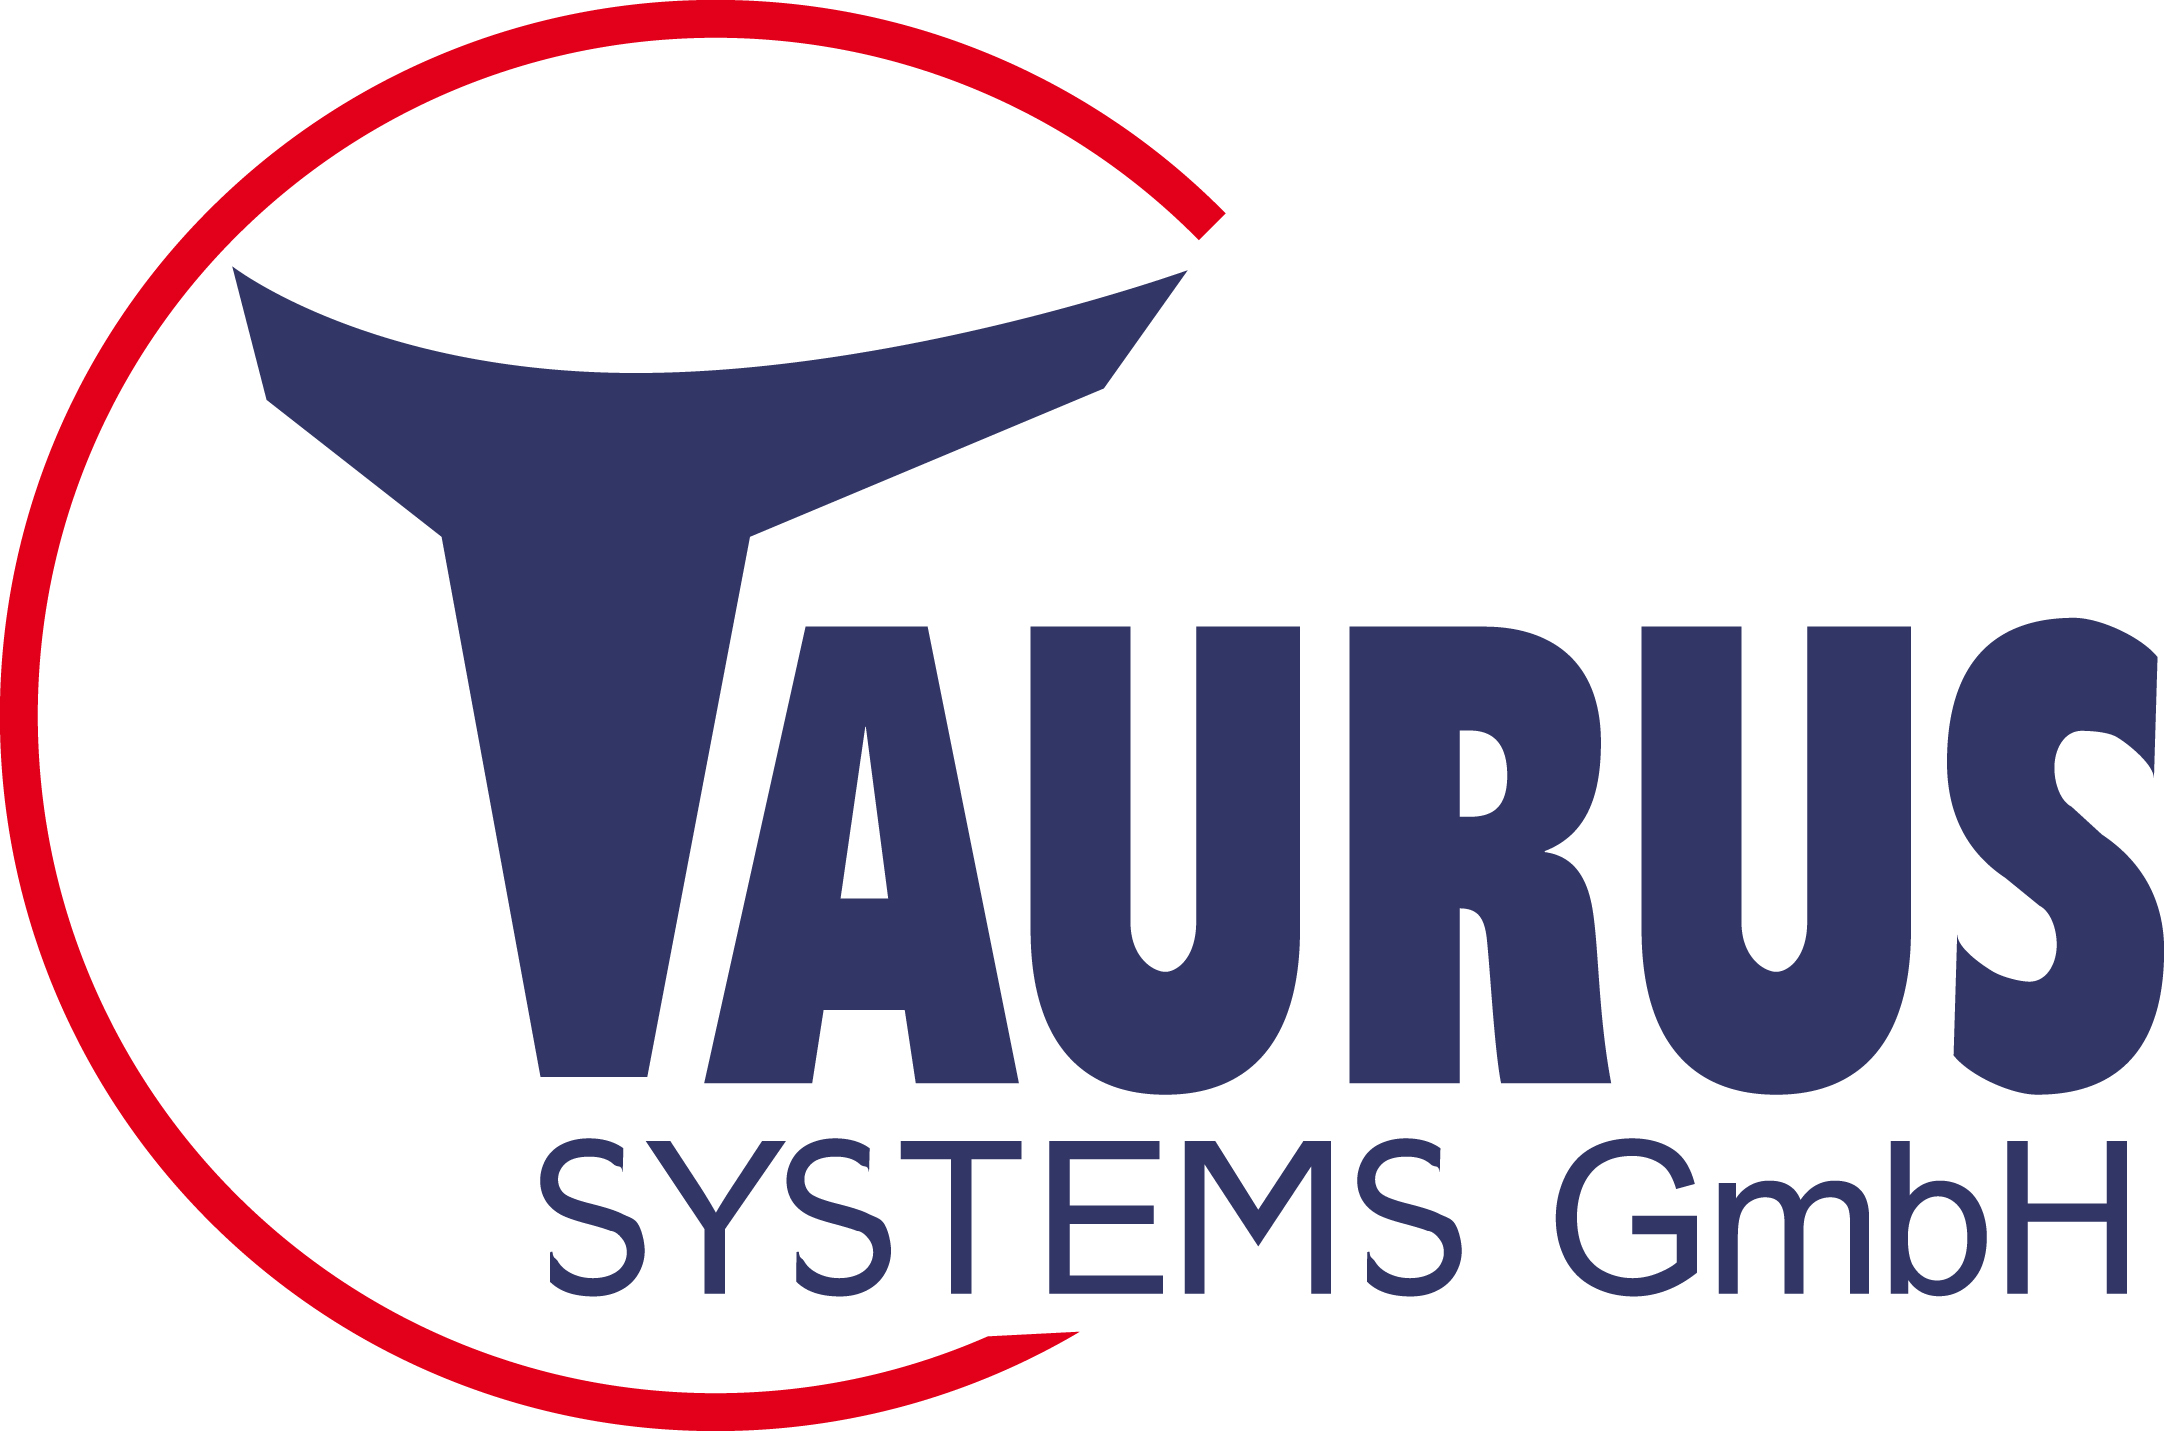 Taurus Systems